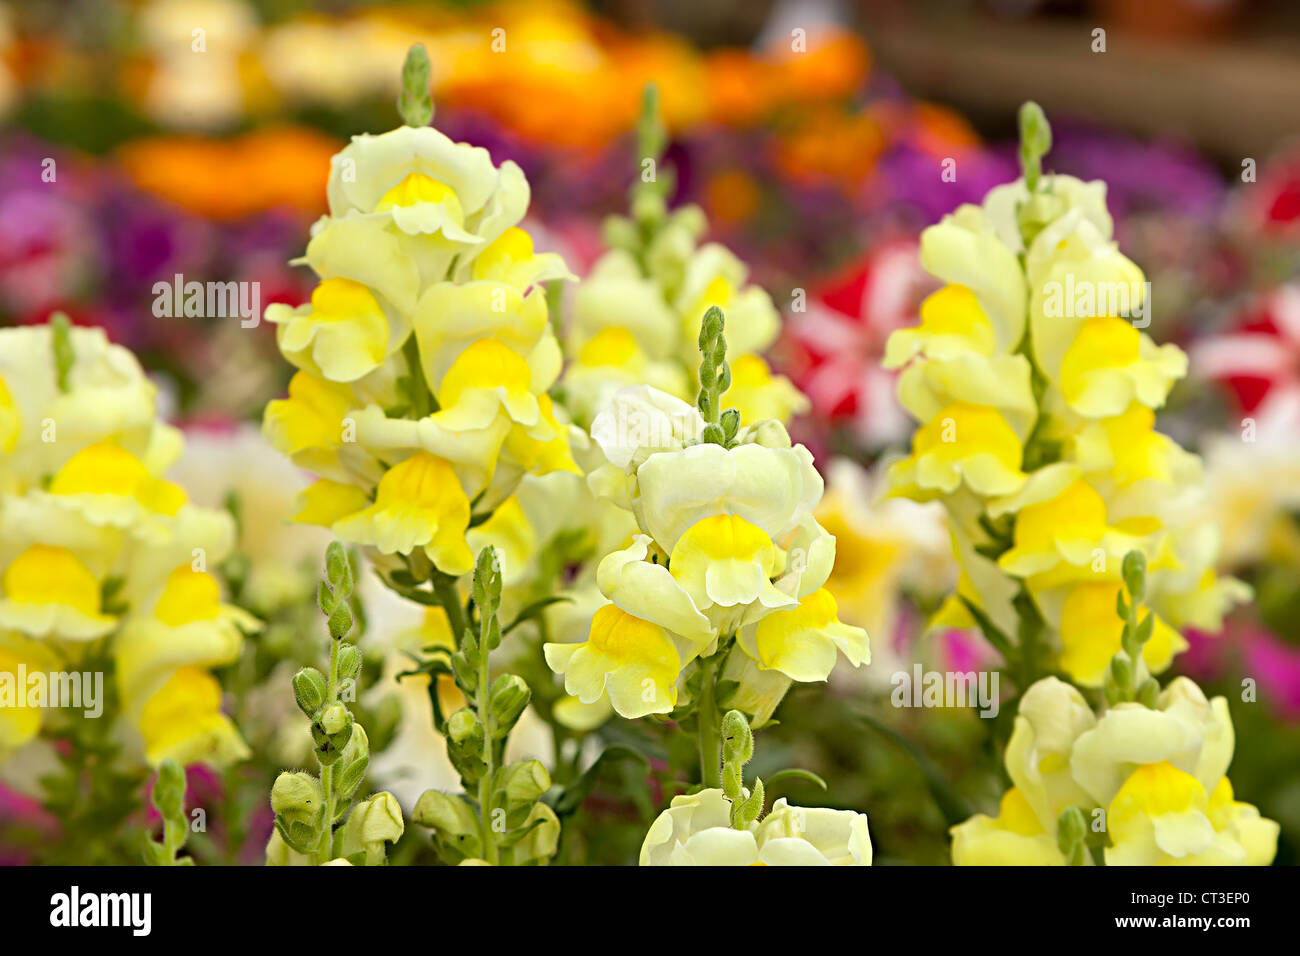 Yellow antirrhinum snapdragon flowers in garden bedding, Wales, UK Stock Photo